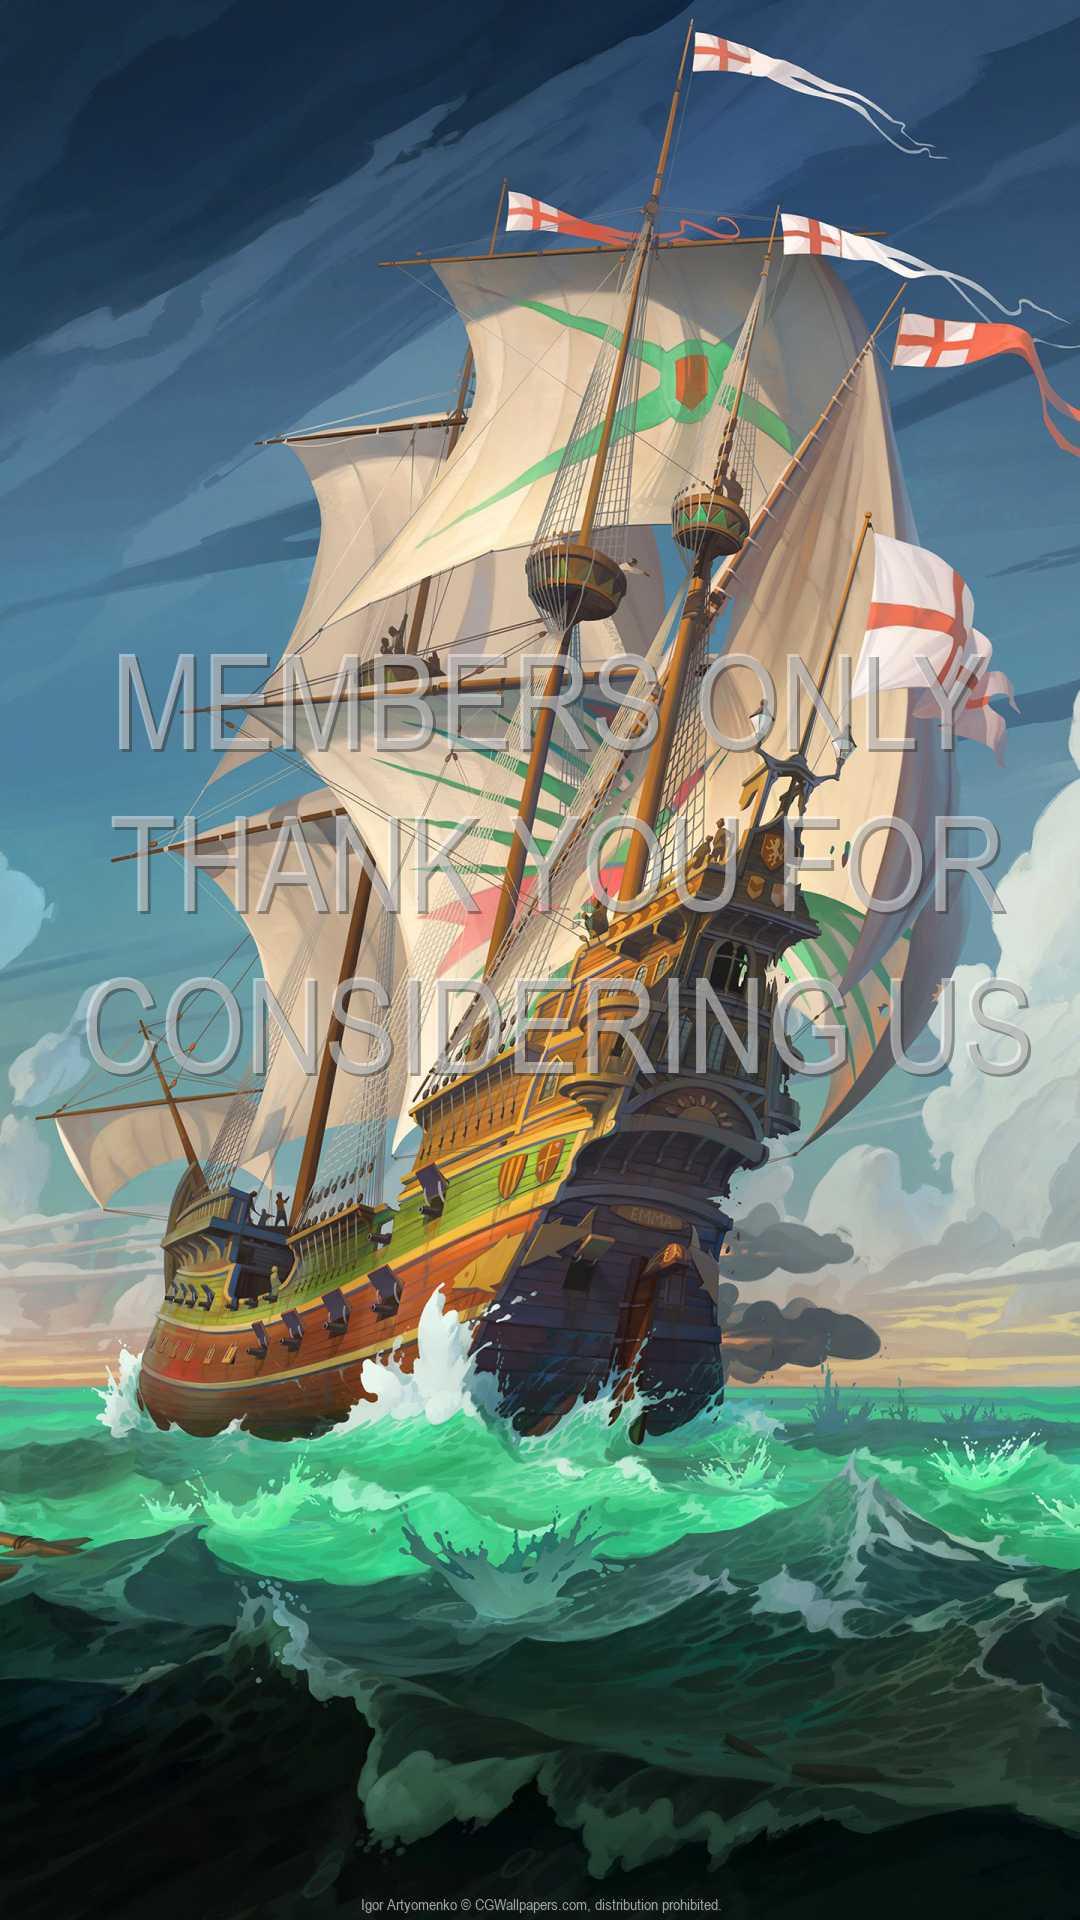 Igor Artyomenko 1080p Vertical Mobile wallpaper or background 08